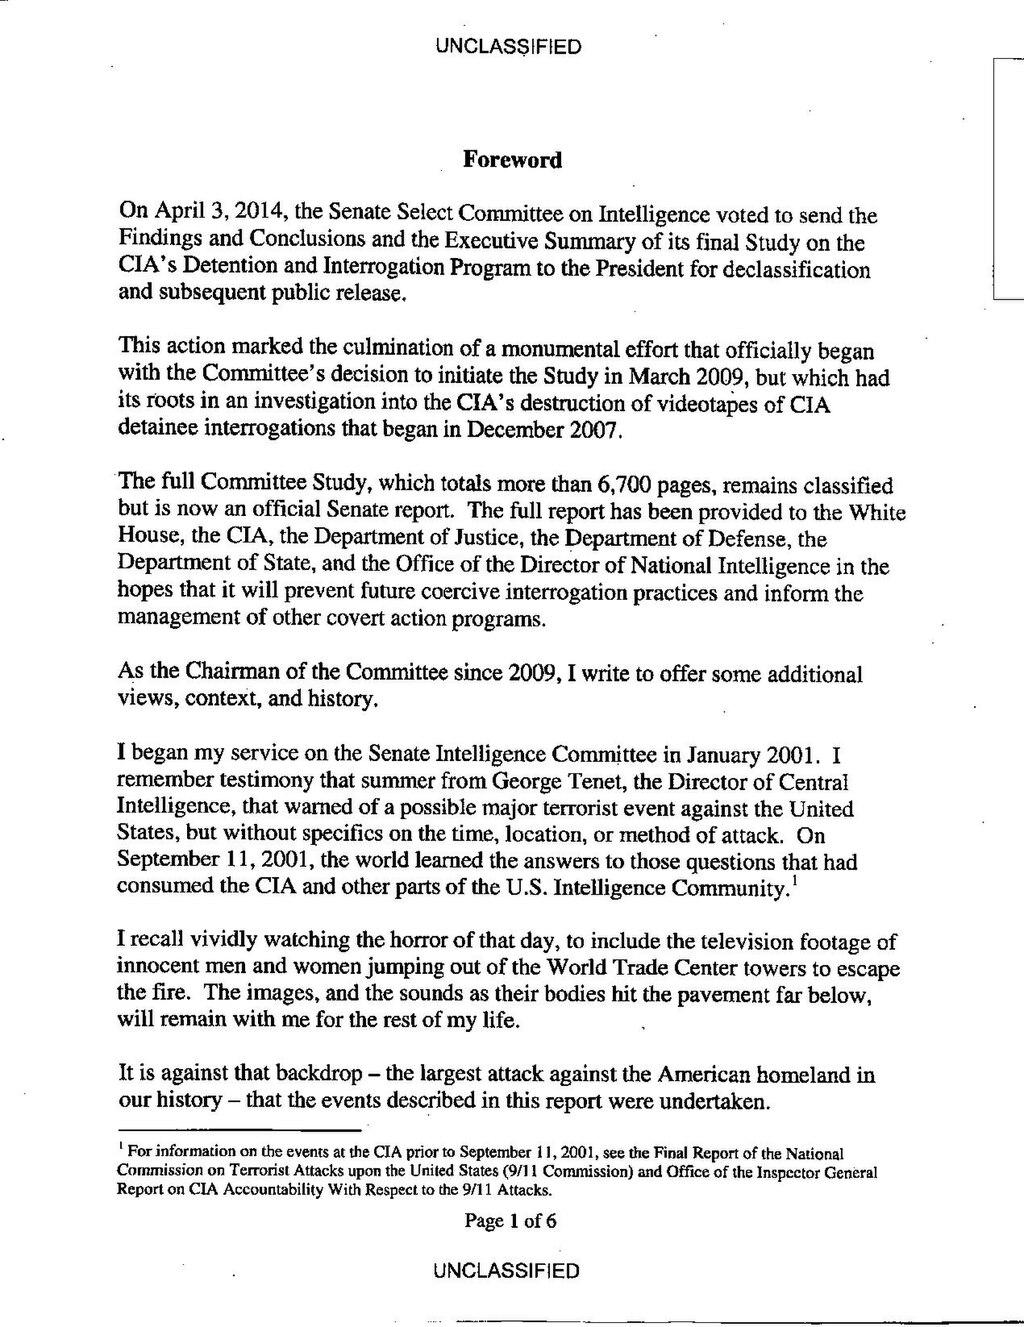 page us senate report on cia detention interrogation program pdf 2